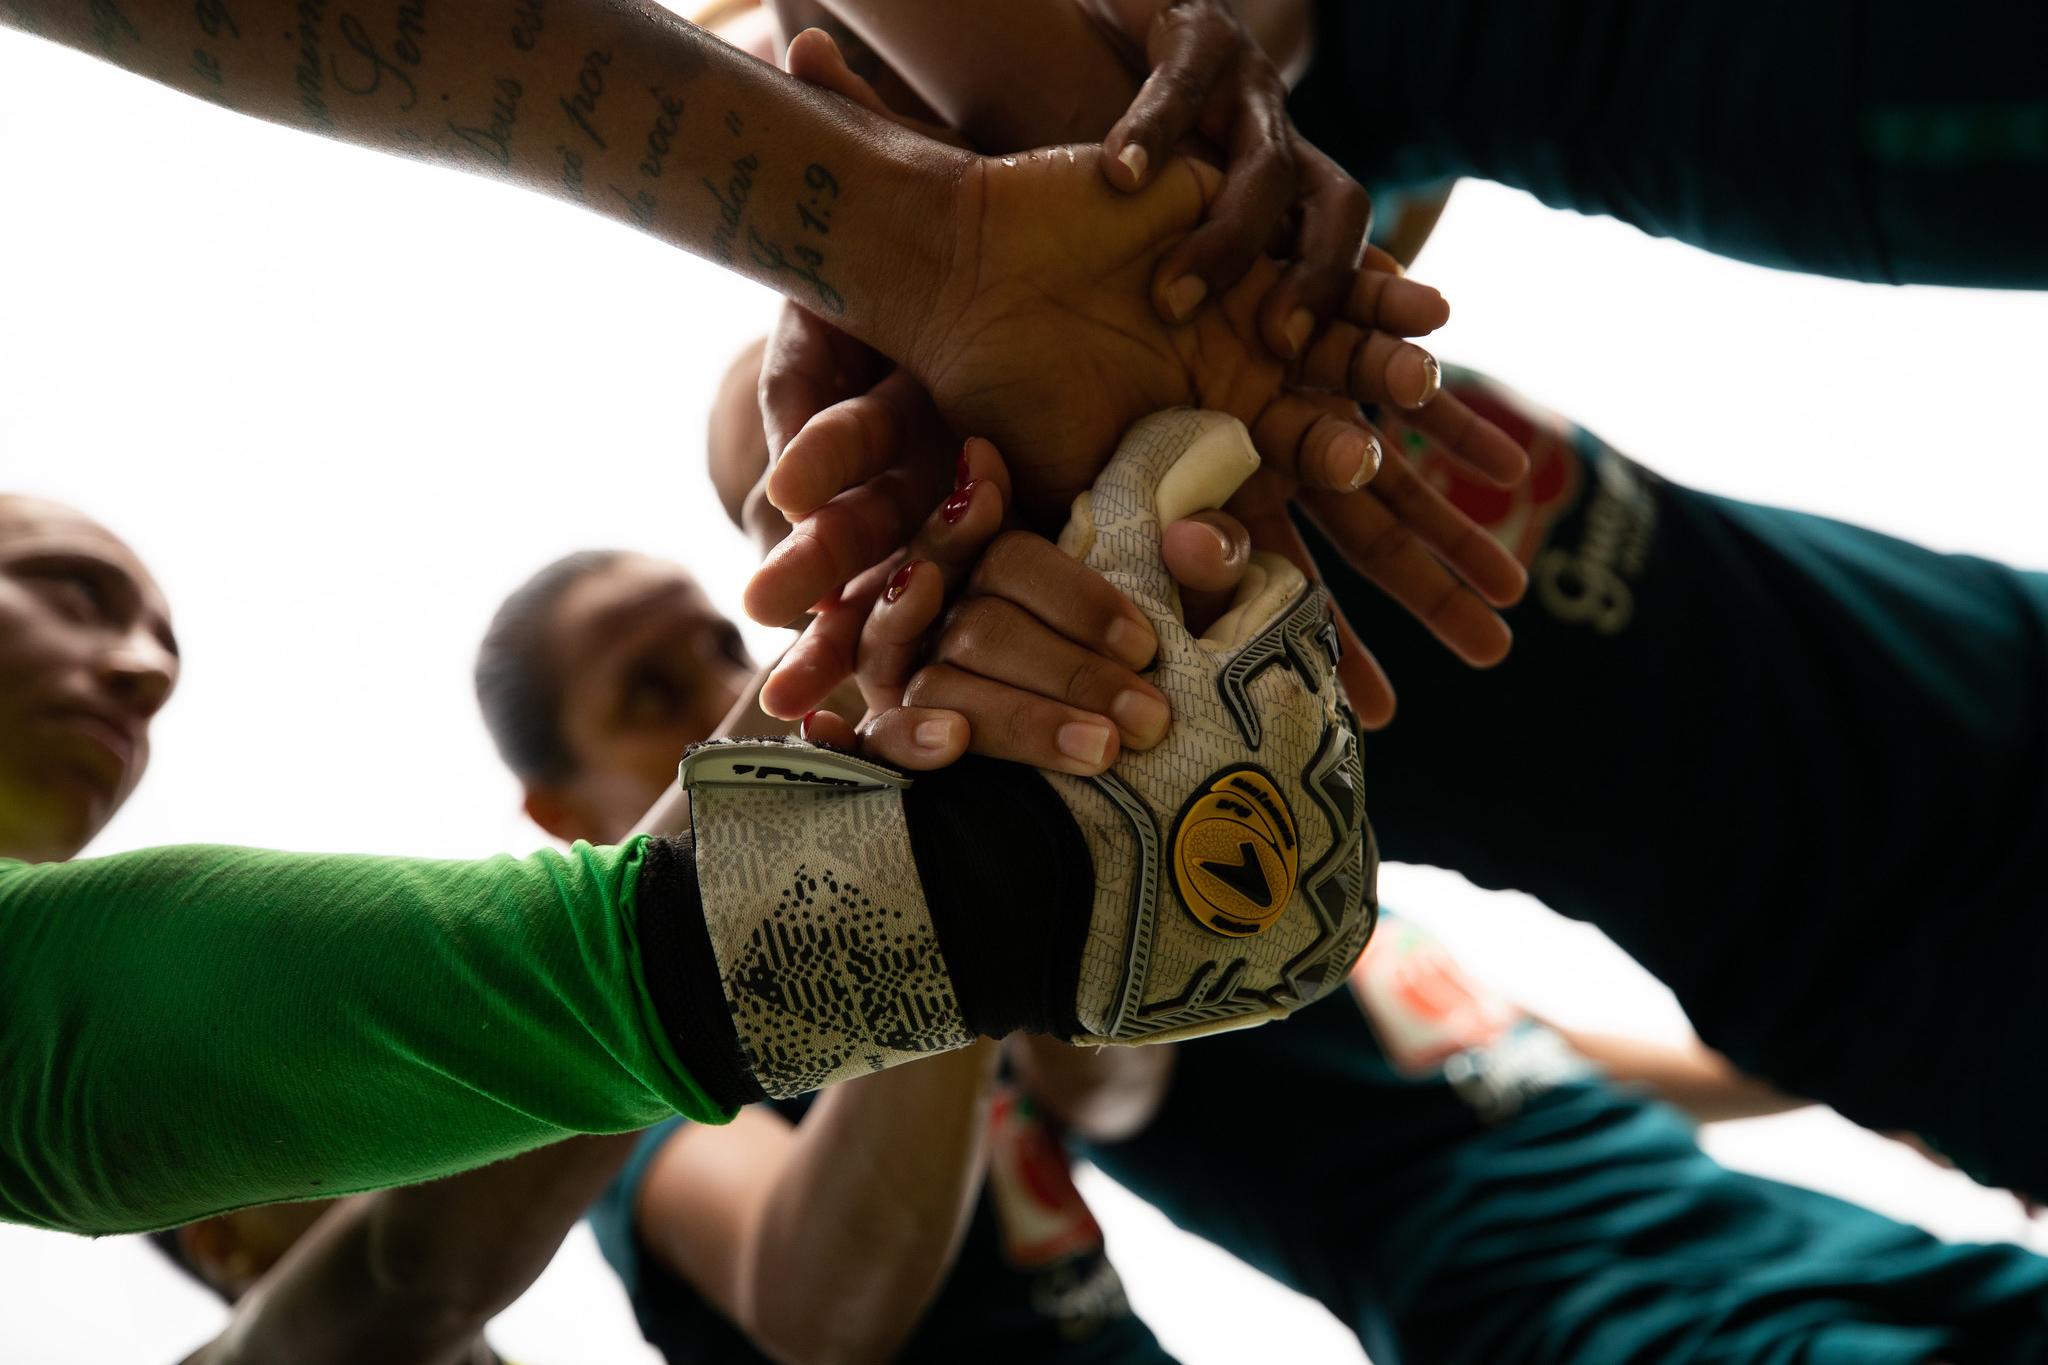 Desafio de manter um grupo unido durante a pandemia fez Pia buscar alternativas | Foto: Laura Zago / CBF